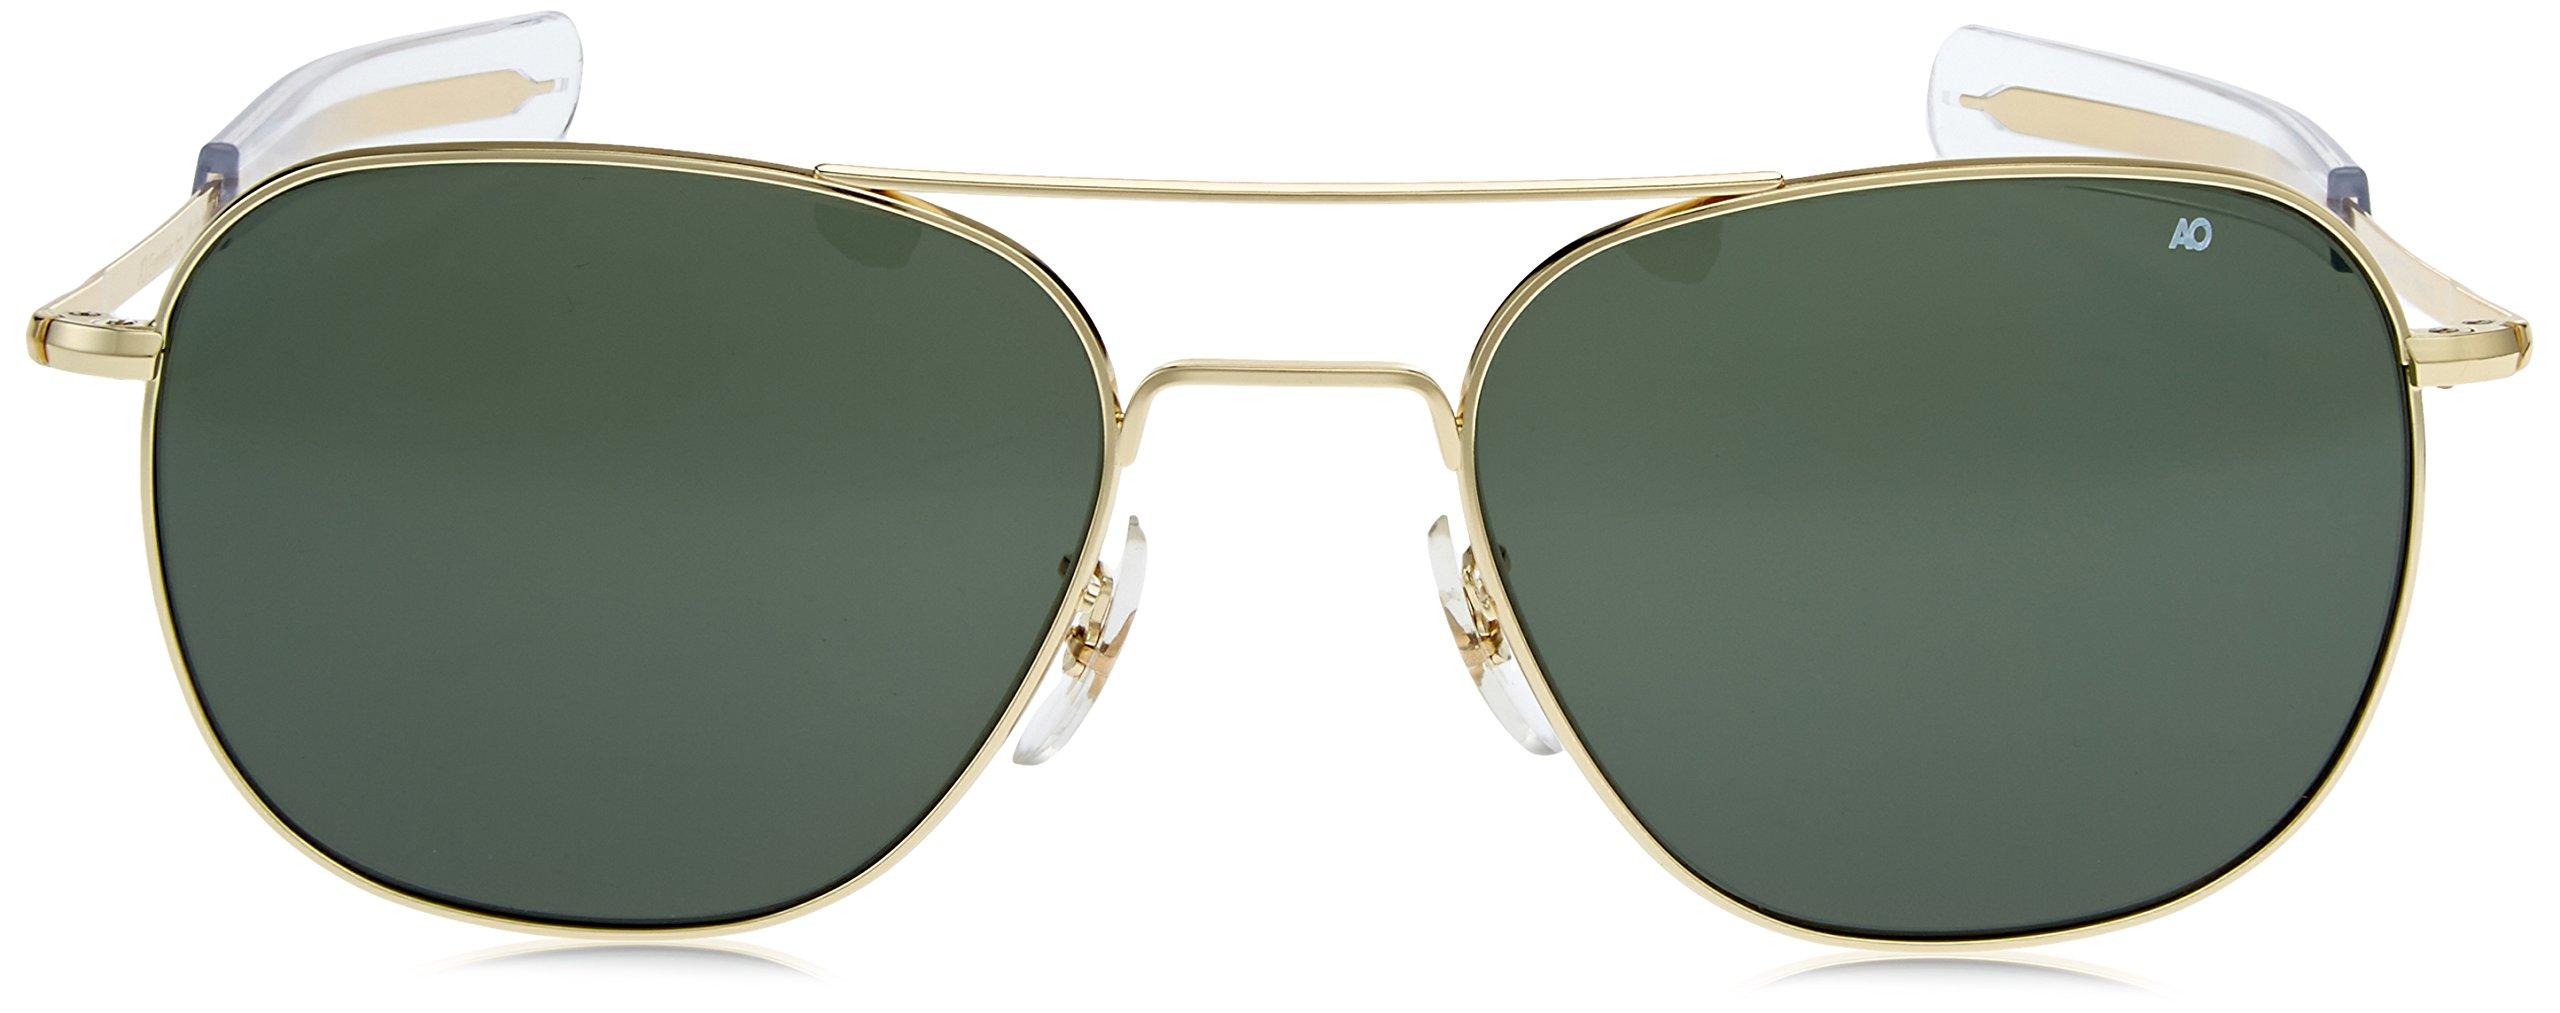 5f9163849428 AO Eyewear American Optical - Original Pilot Aviator Sunglasses with  Bayonet Temple and Gold Frame, Calobar Green Glass Lens - 32198OP57GBATCG <  Sports ...